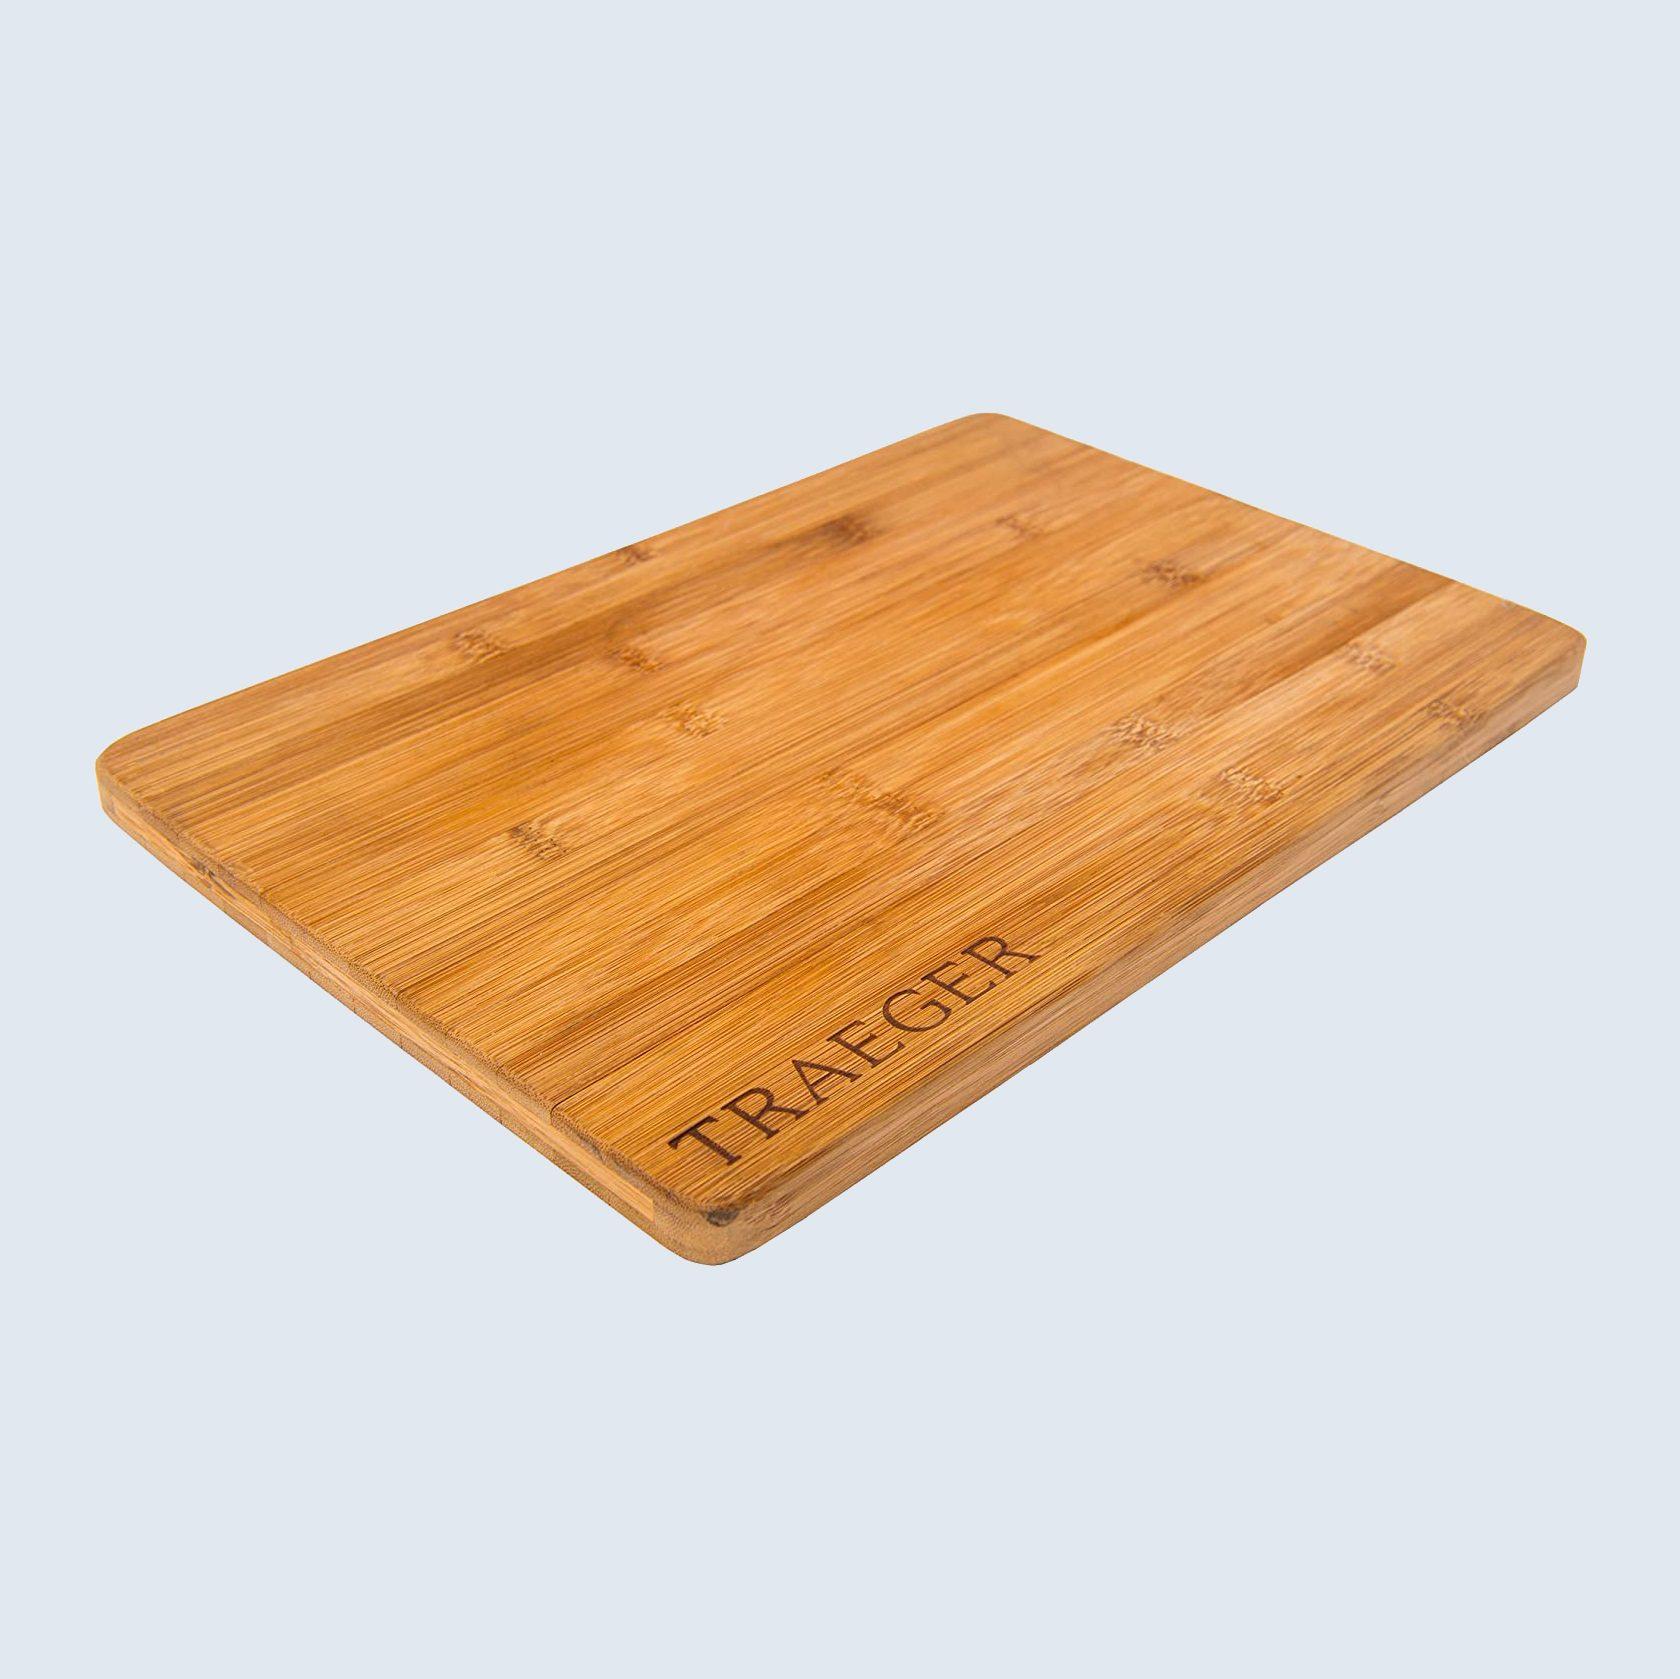 Traeger bamboo cutting board